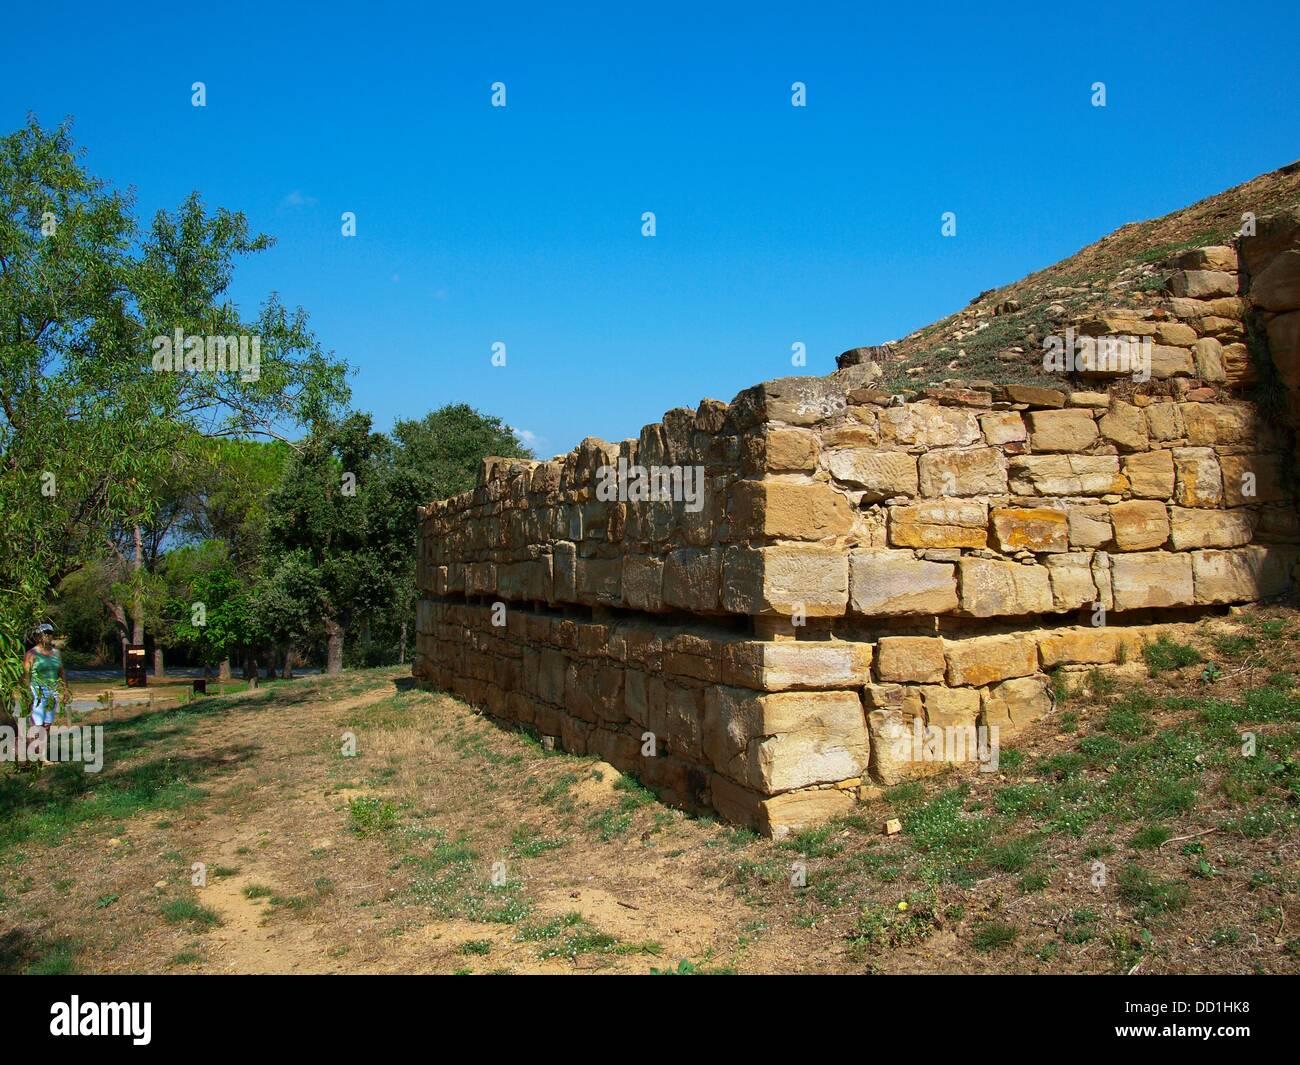 Ullastret Iberian Archeologycal Site Bronze Era Catalunya Spain